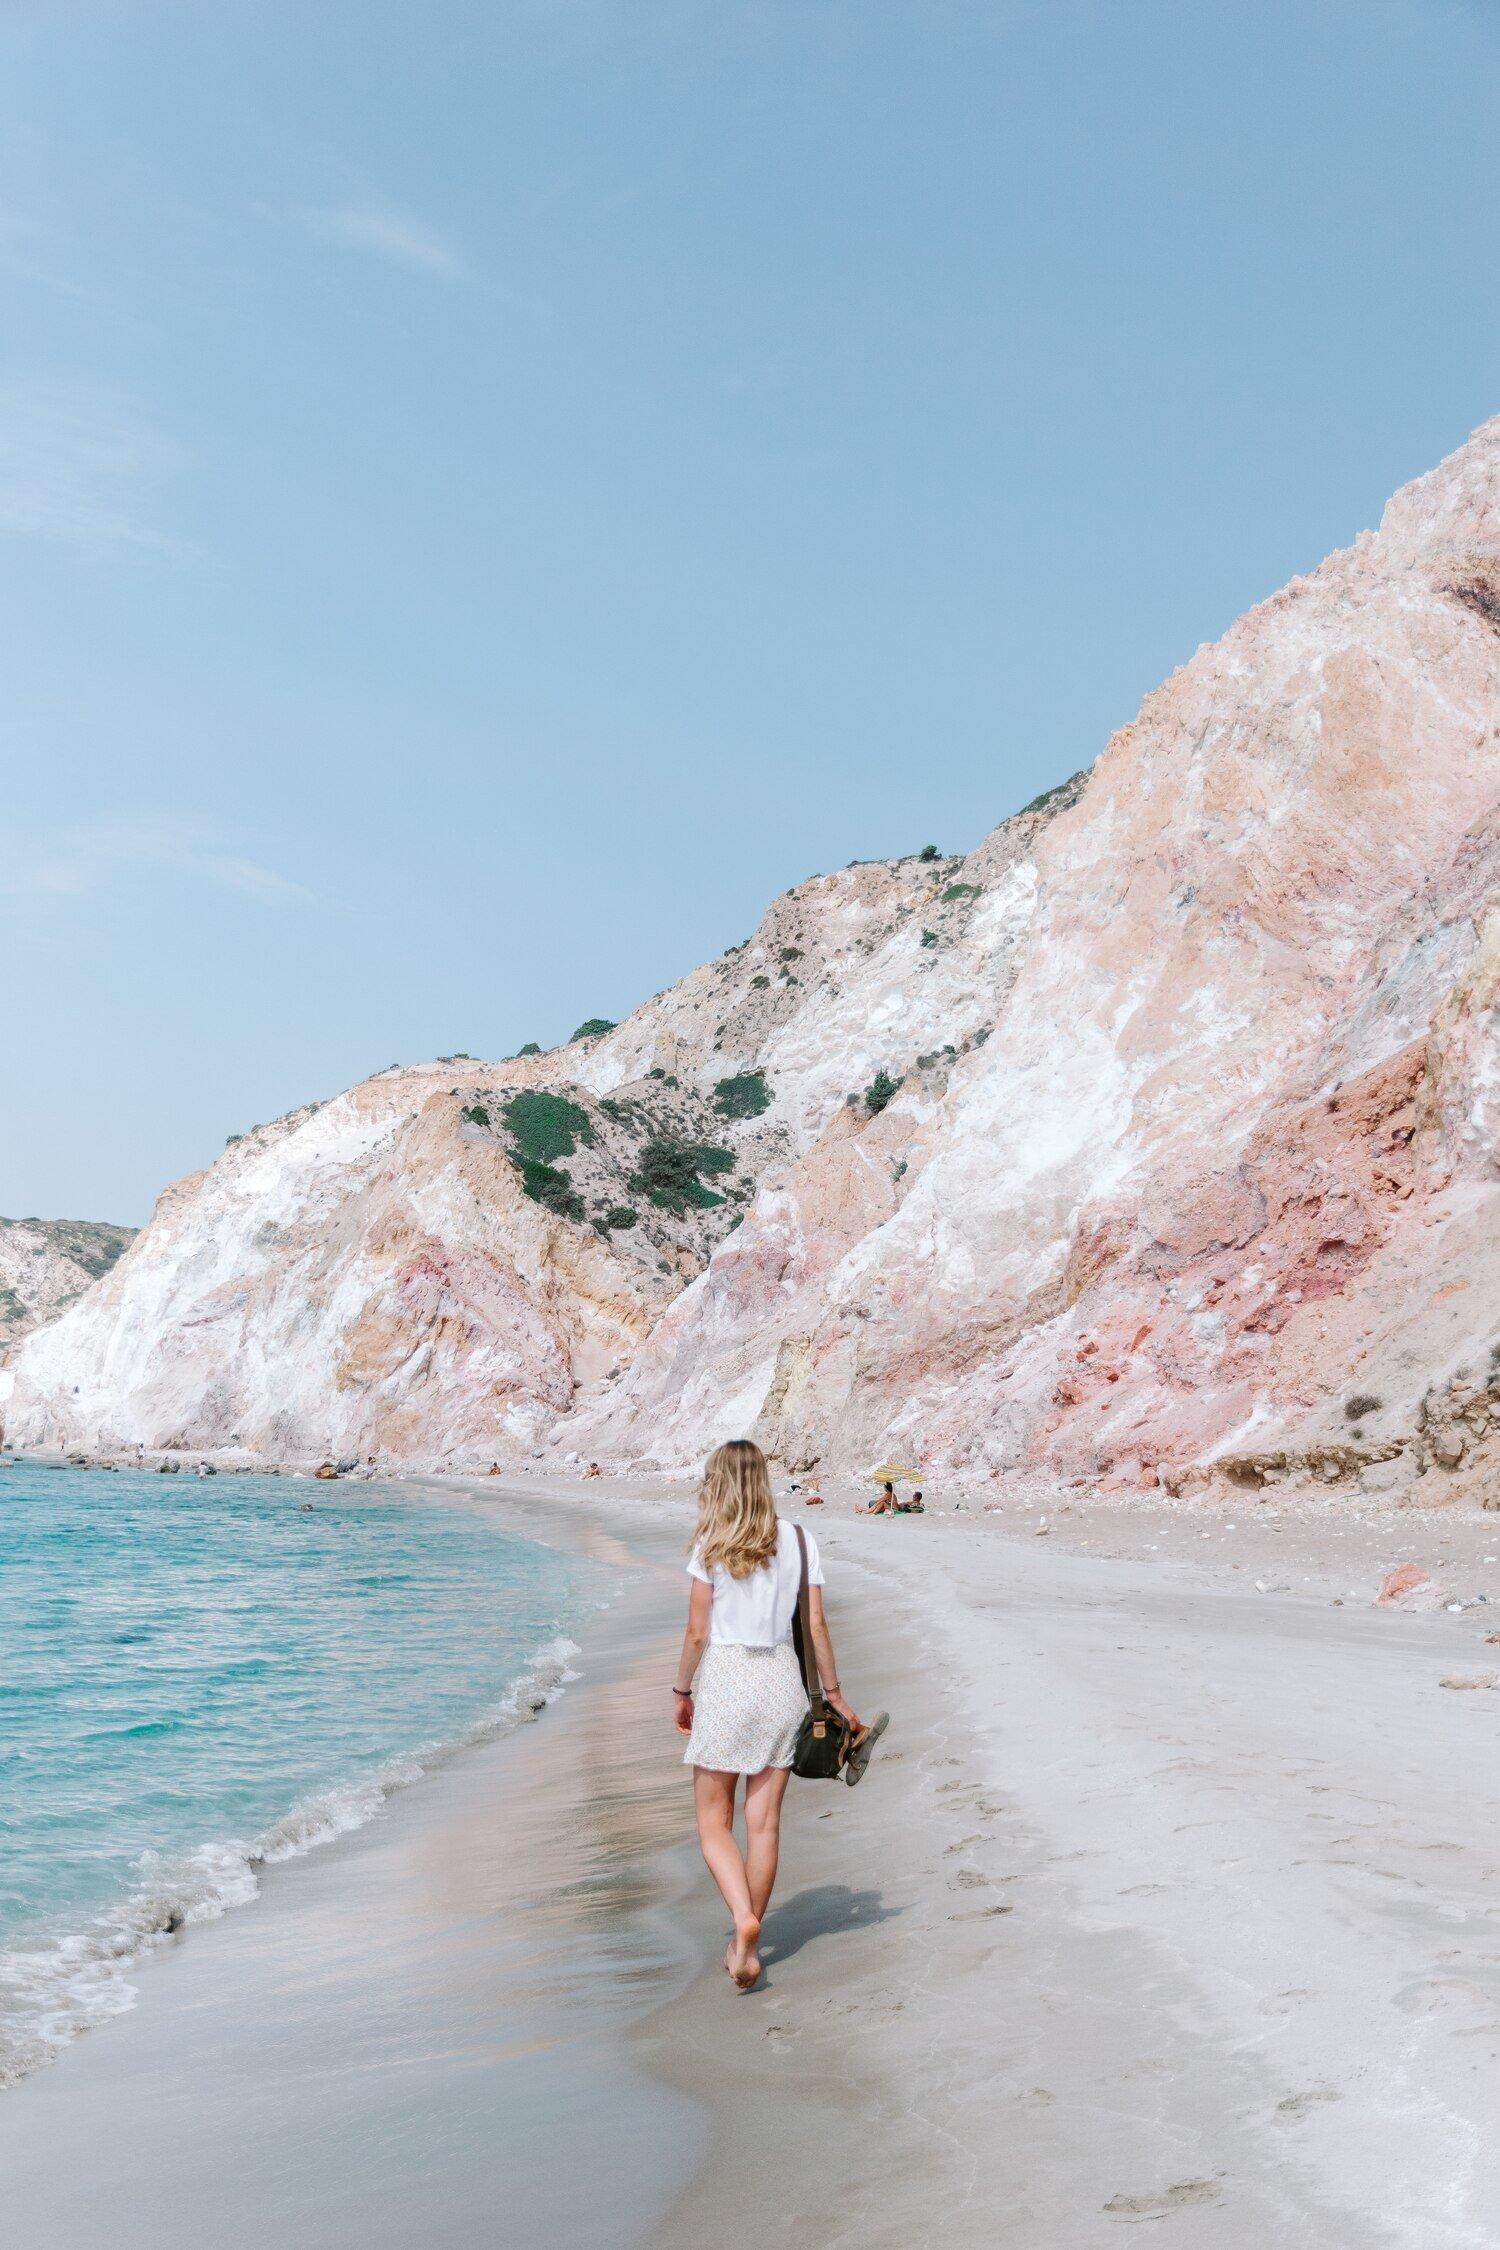 One of the Greek Island Milos best beaches Fyriplaka Beach or Firiplaka Beach